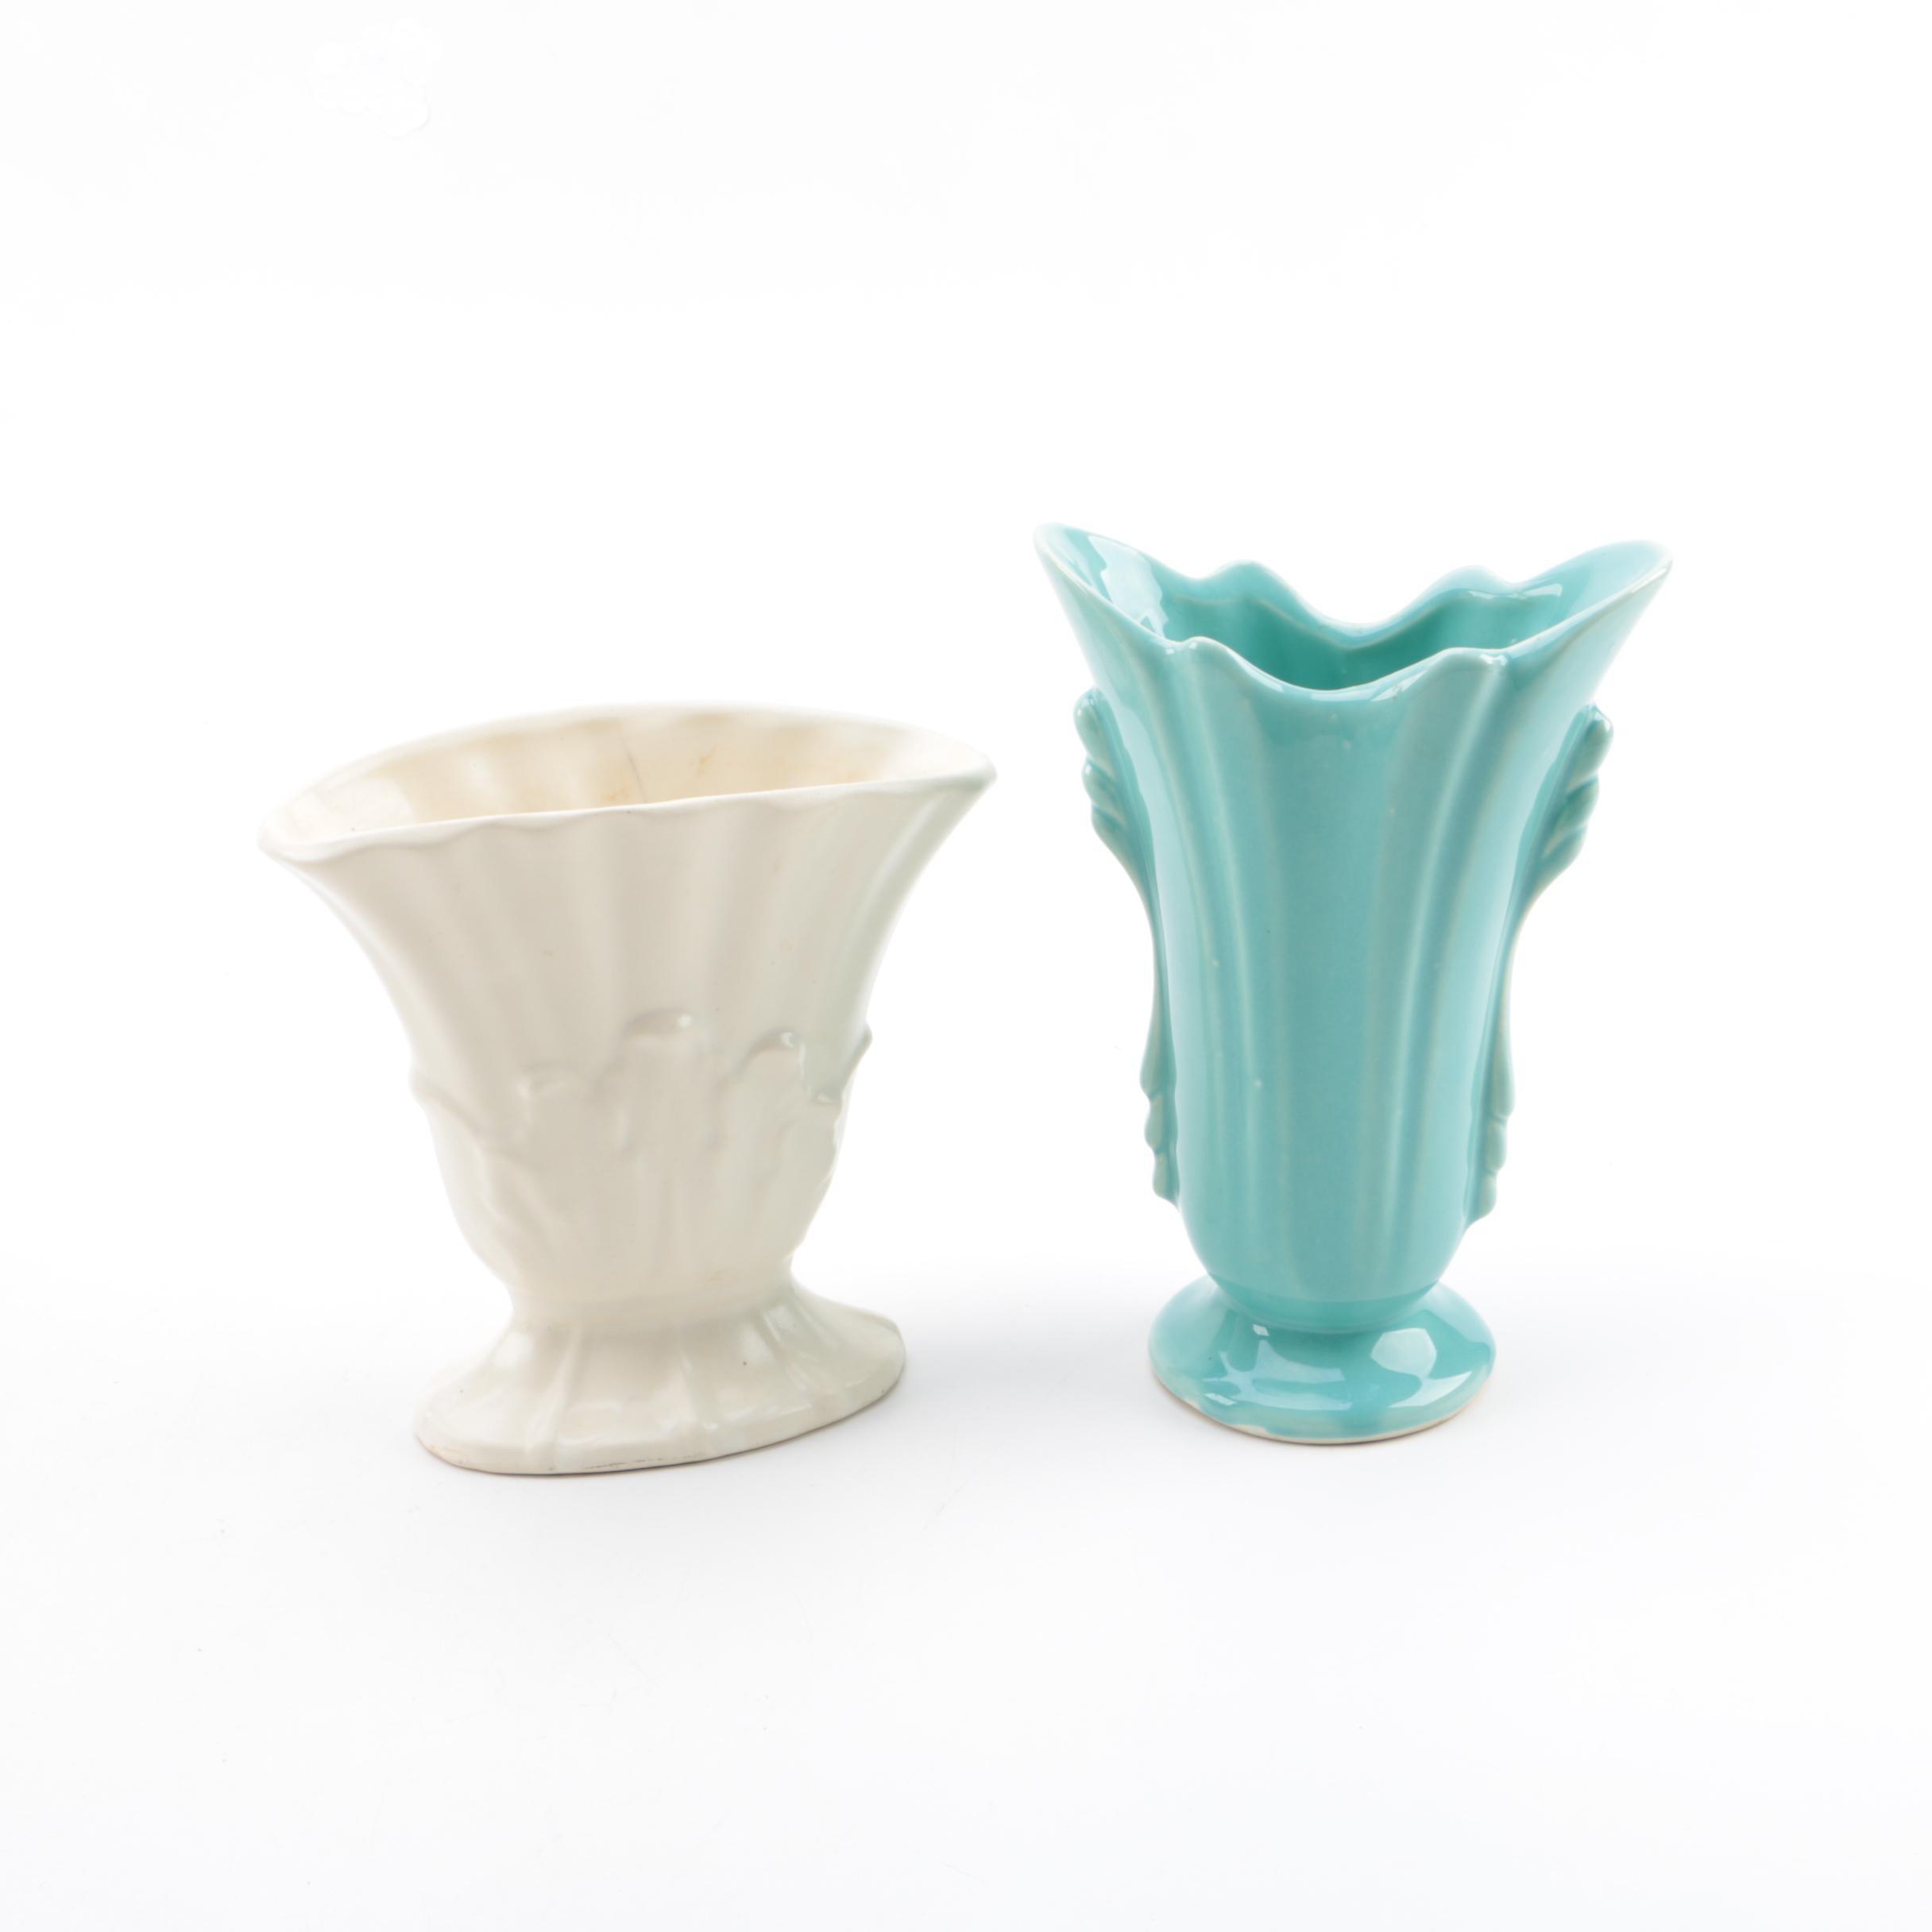 Pair of Mid Century Style Vases